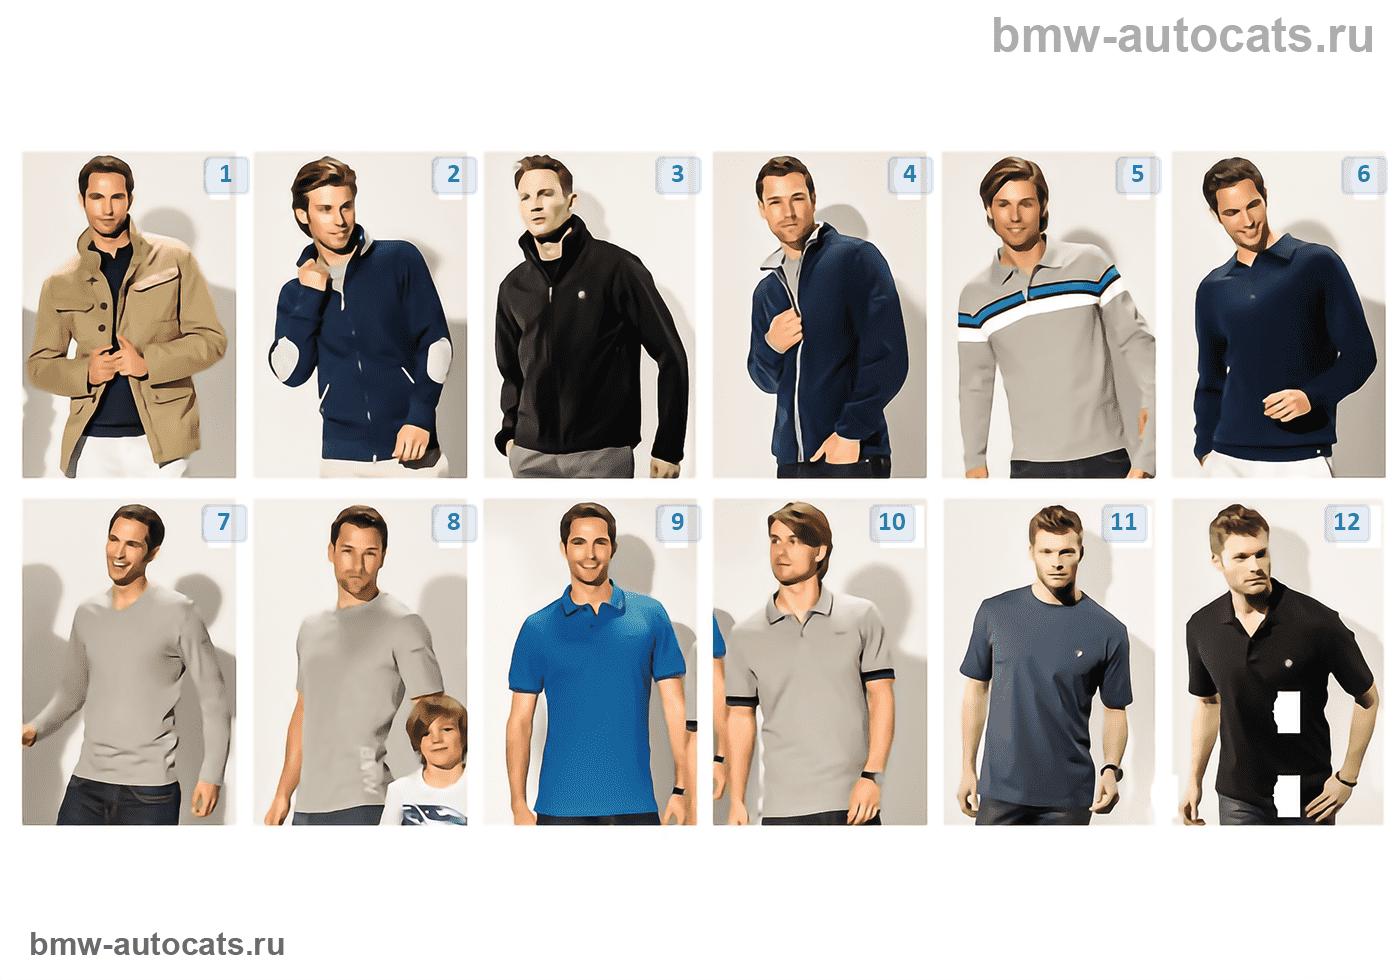 BMW Collection — мужская одежда 2012/13